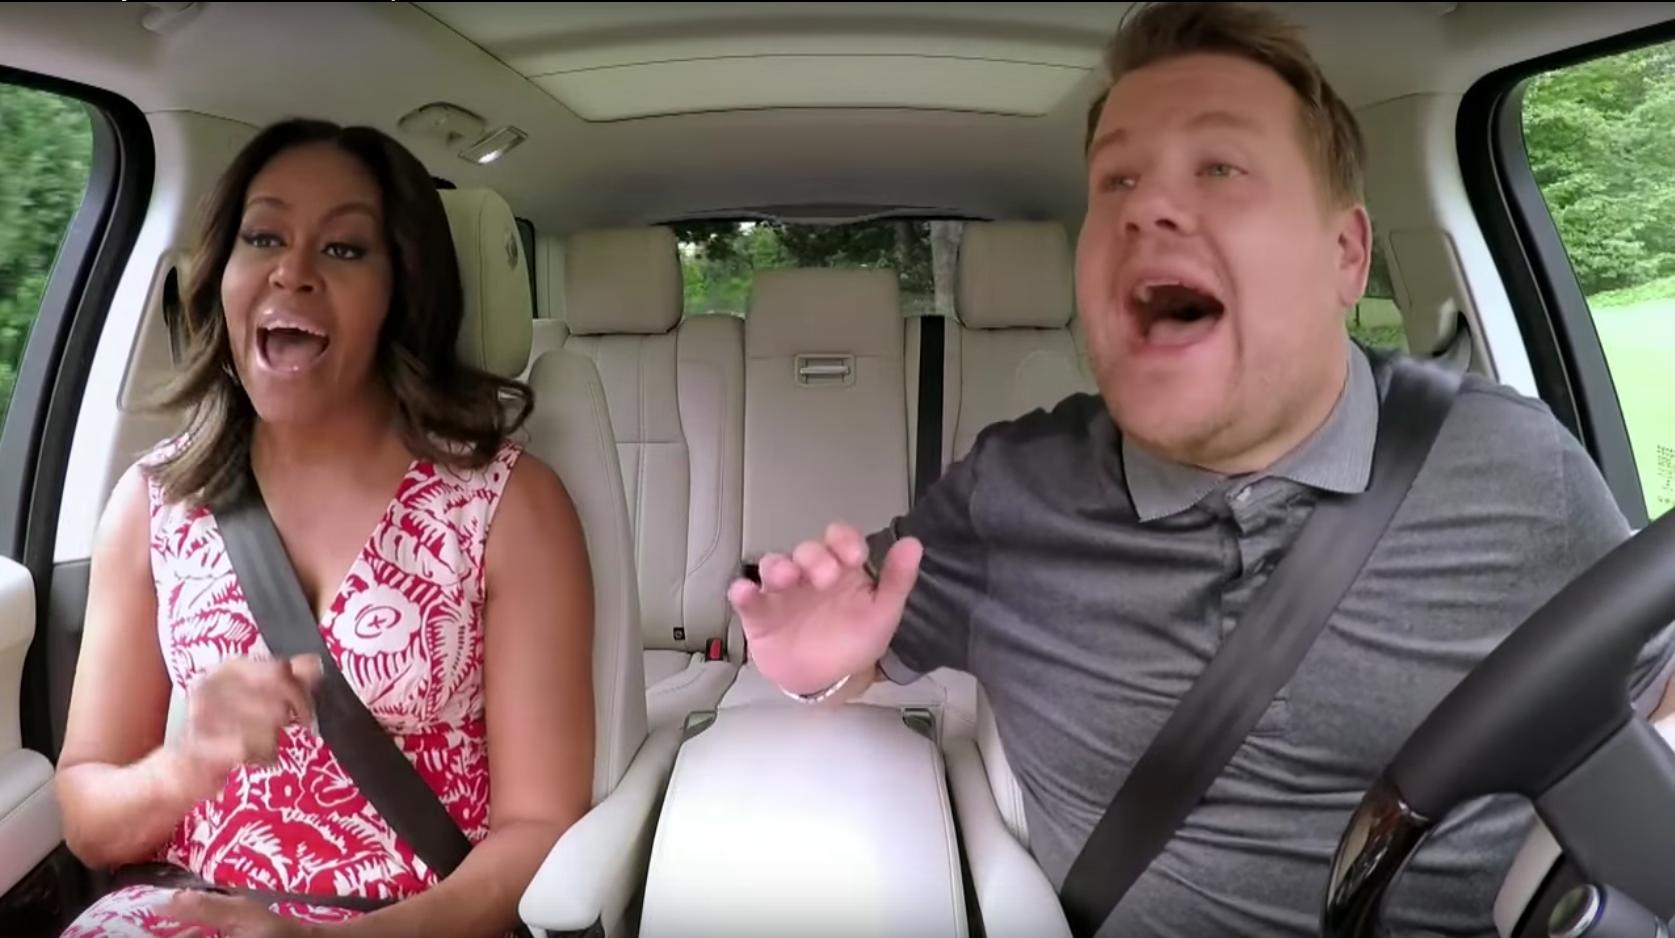 James Corden and Michelle Obama doing Car Karaoke